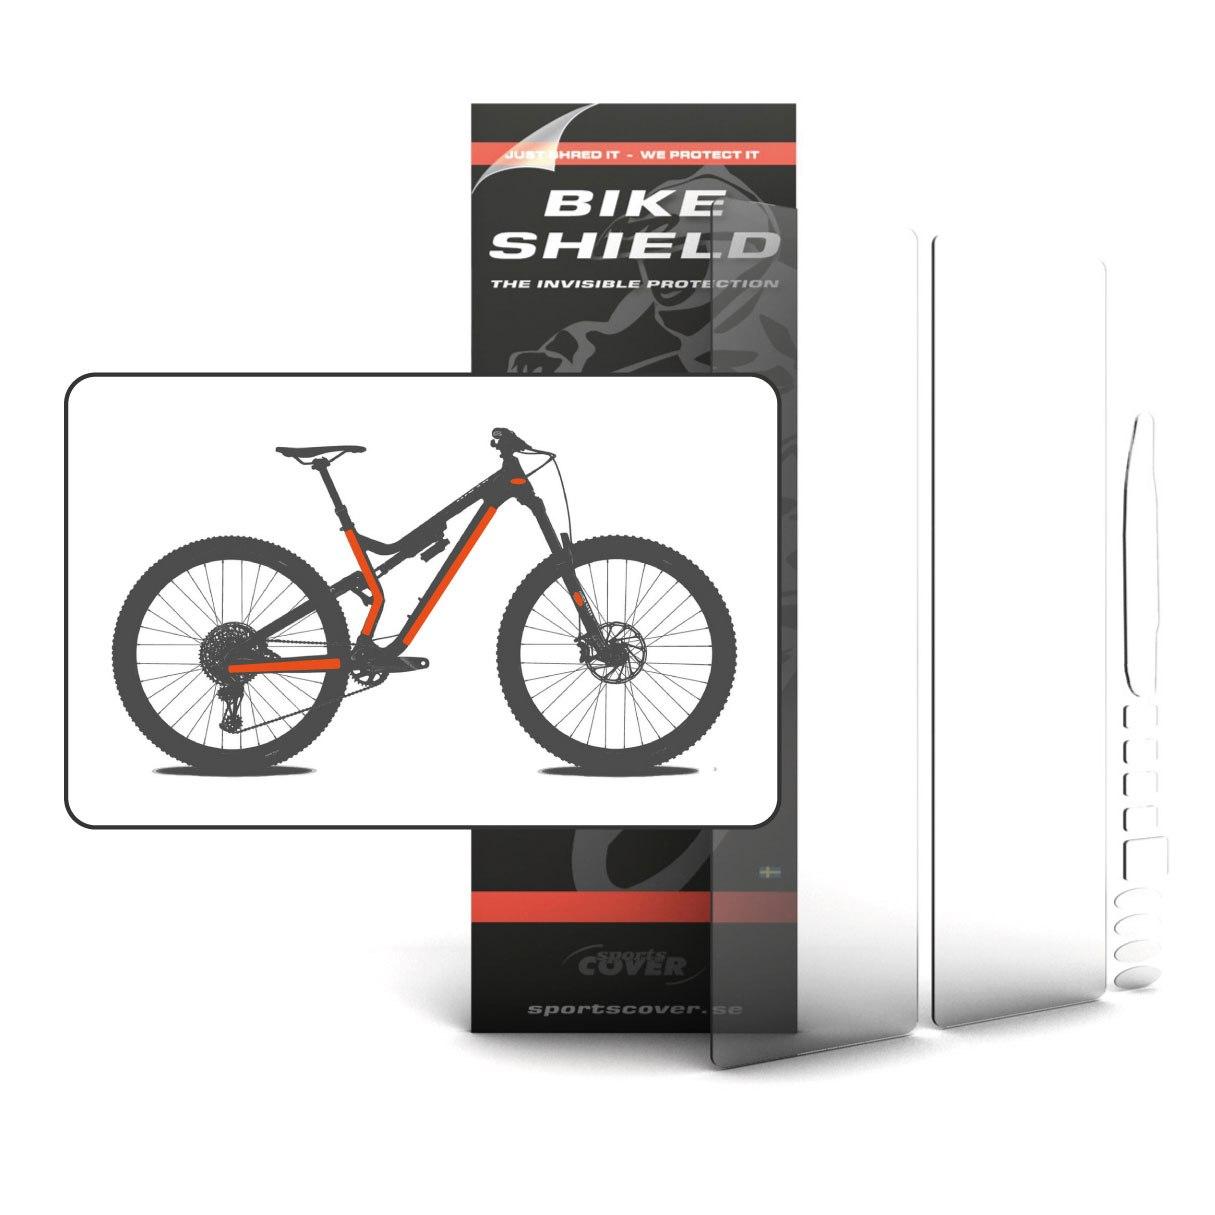 BikeShield Fullpack Oversize Frame Protection 12 pieces - standard